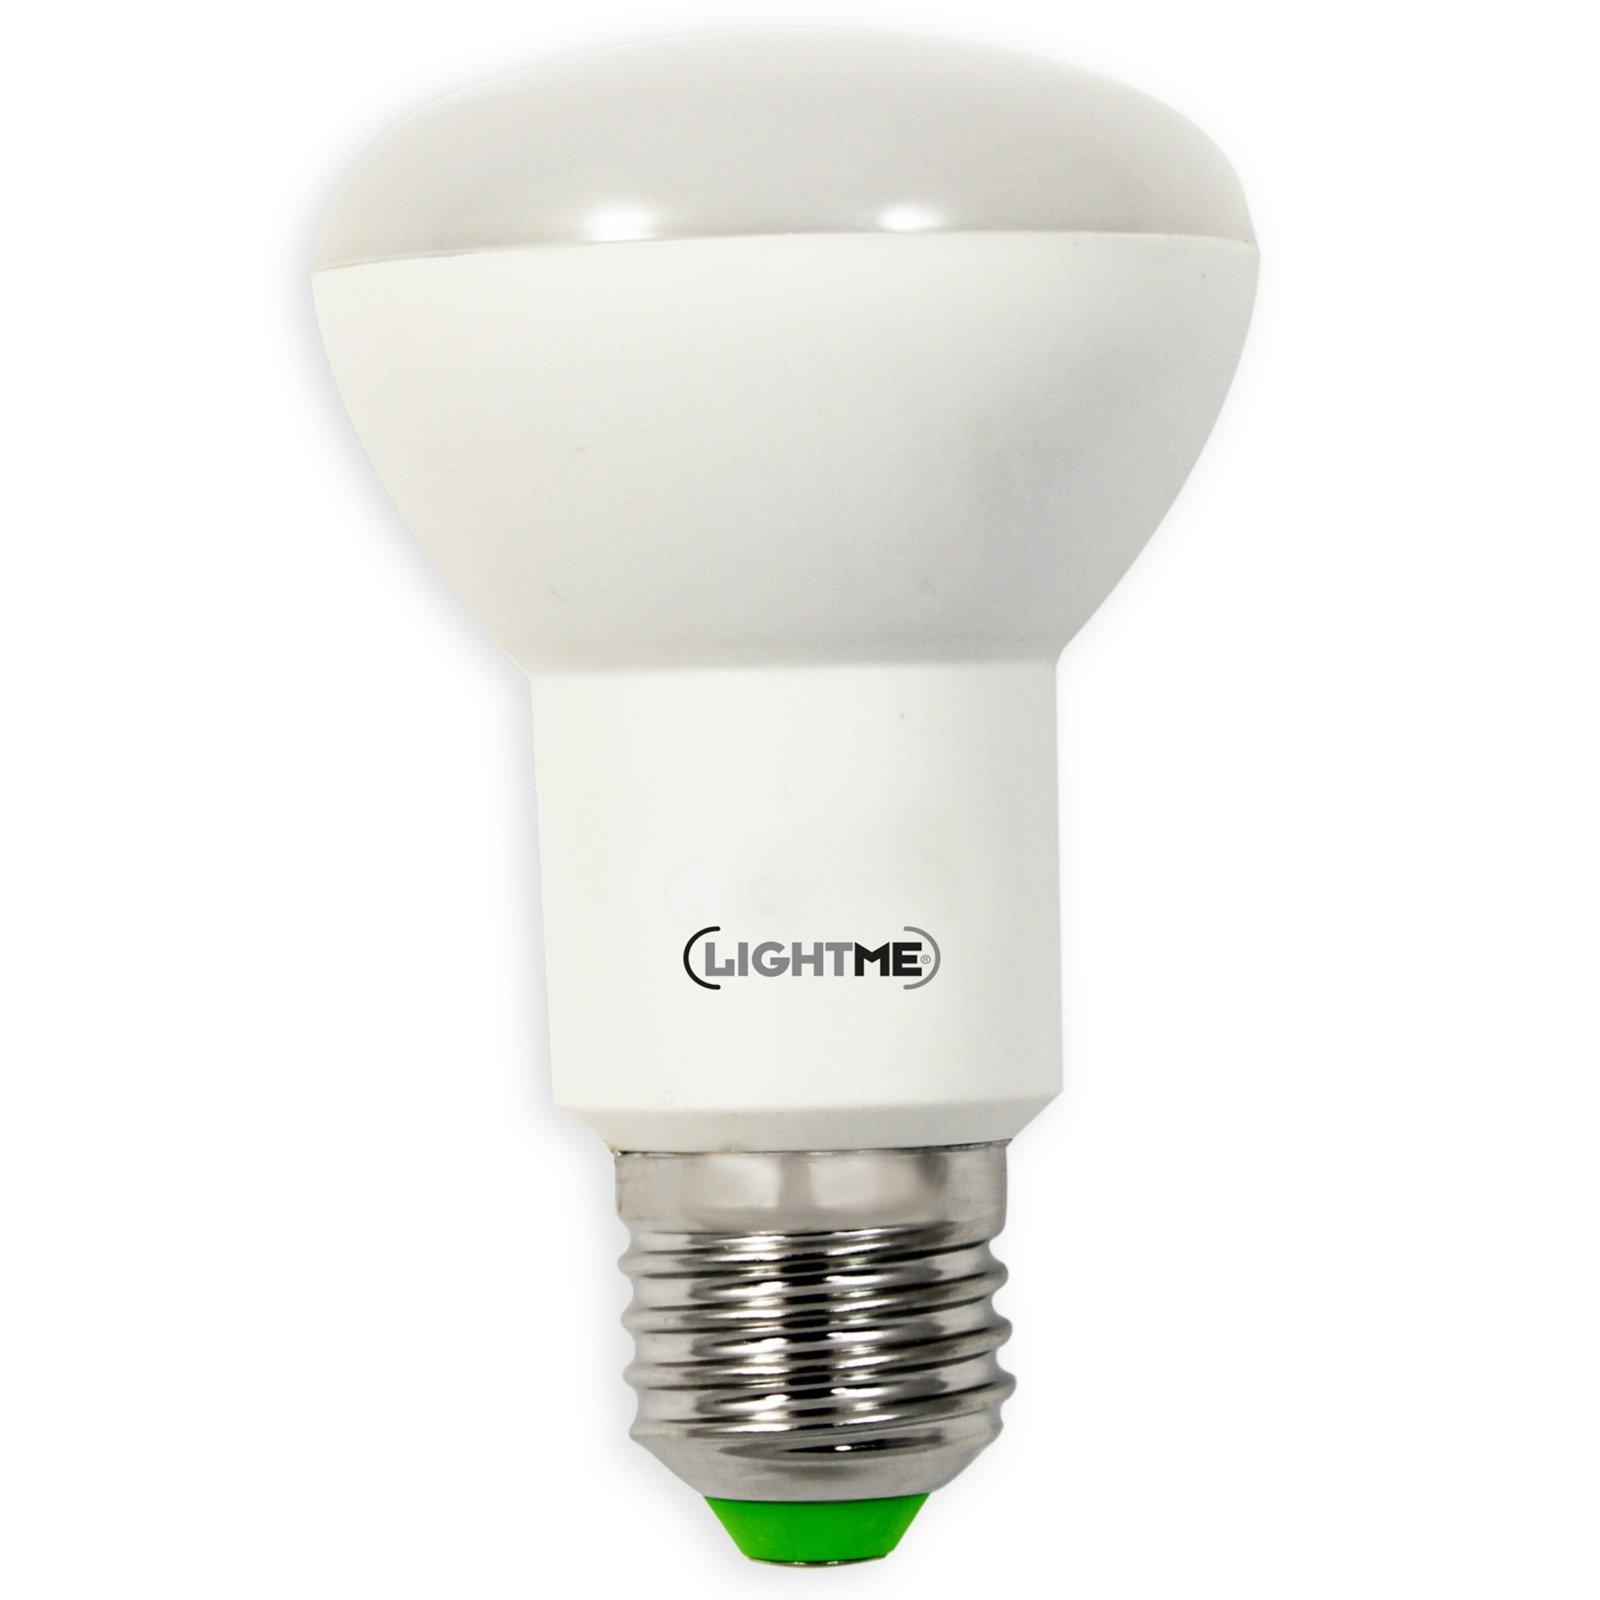 led reflektor lightme e27 8 watt warmwei led. Black Bedroom Furniture Sets. Home Design Ideas